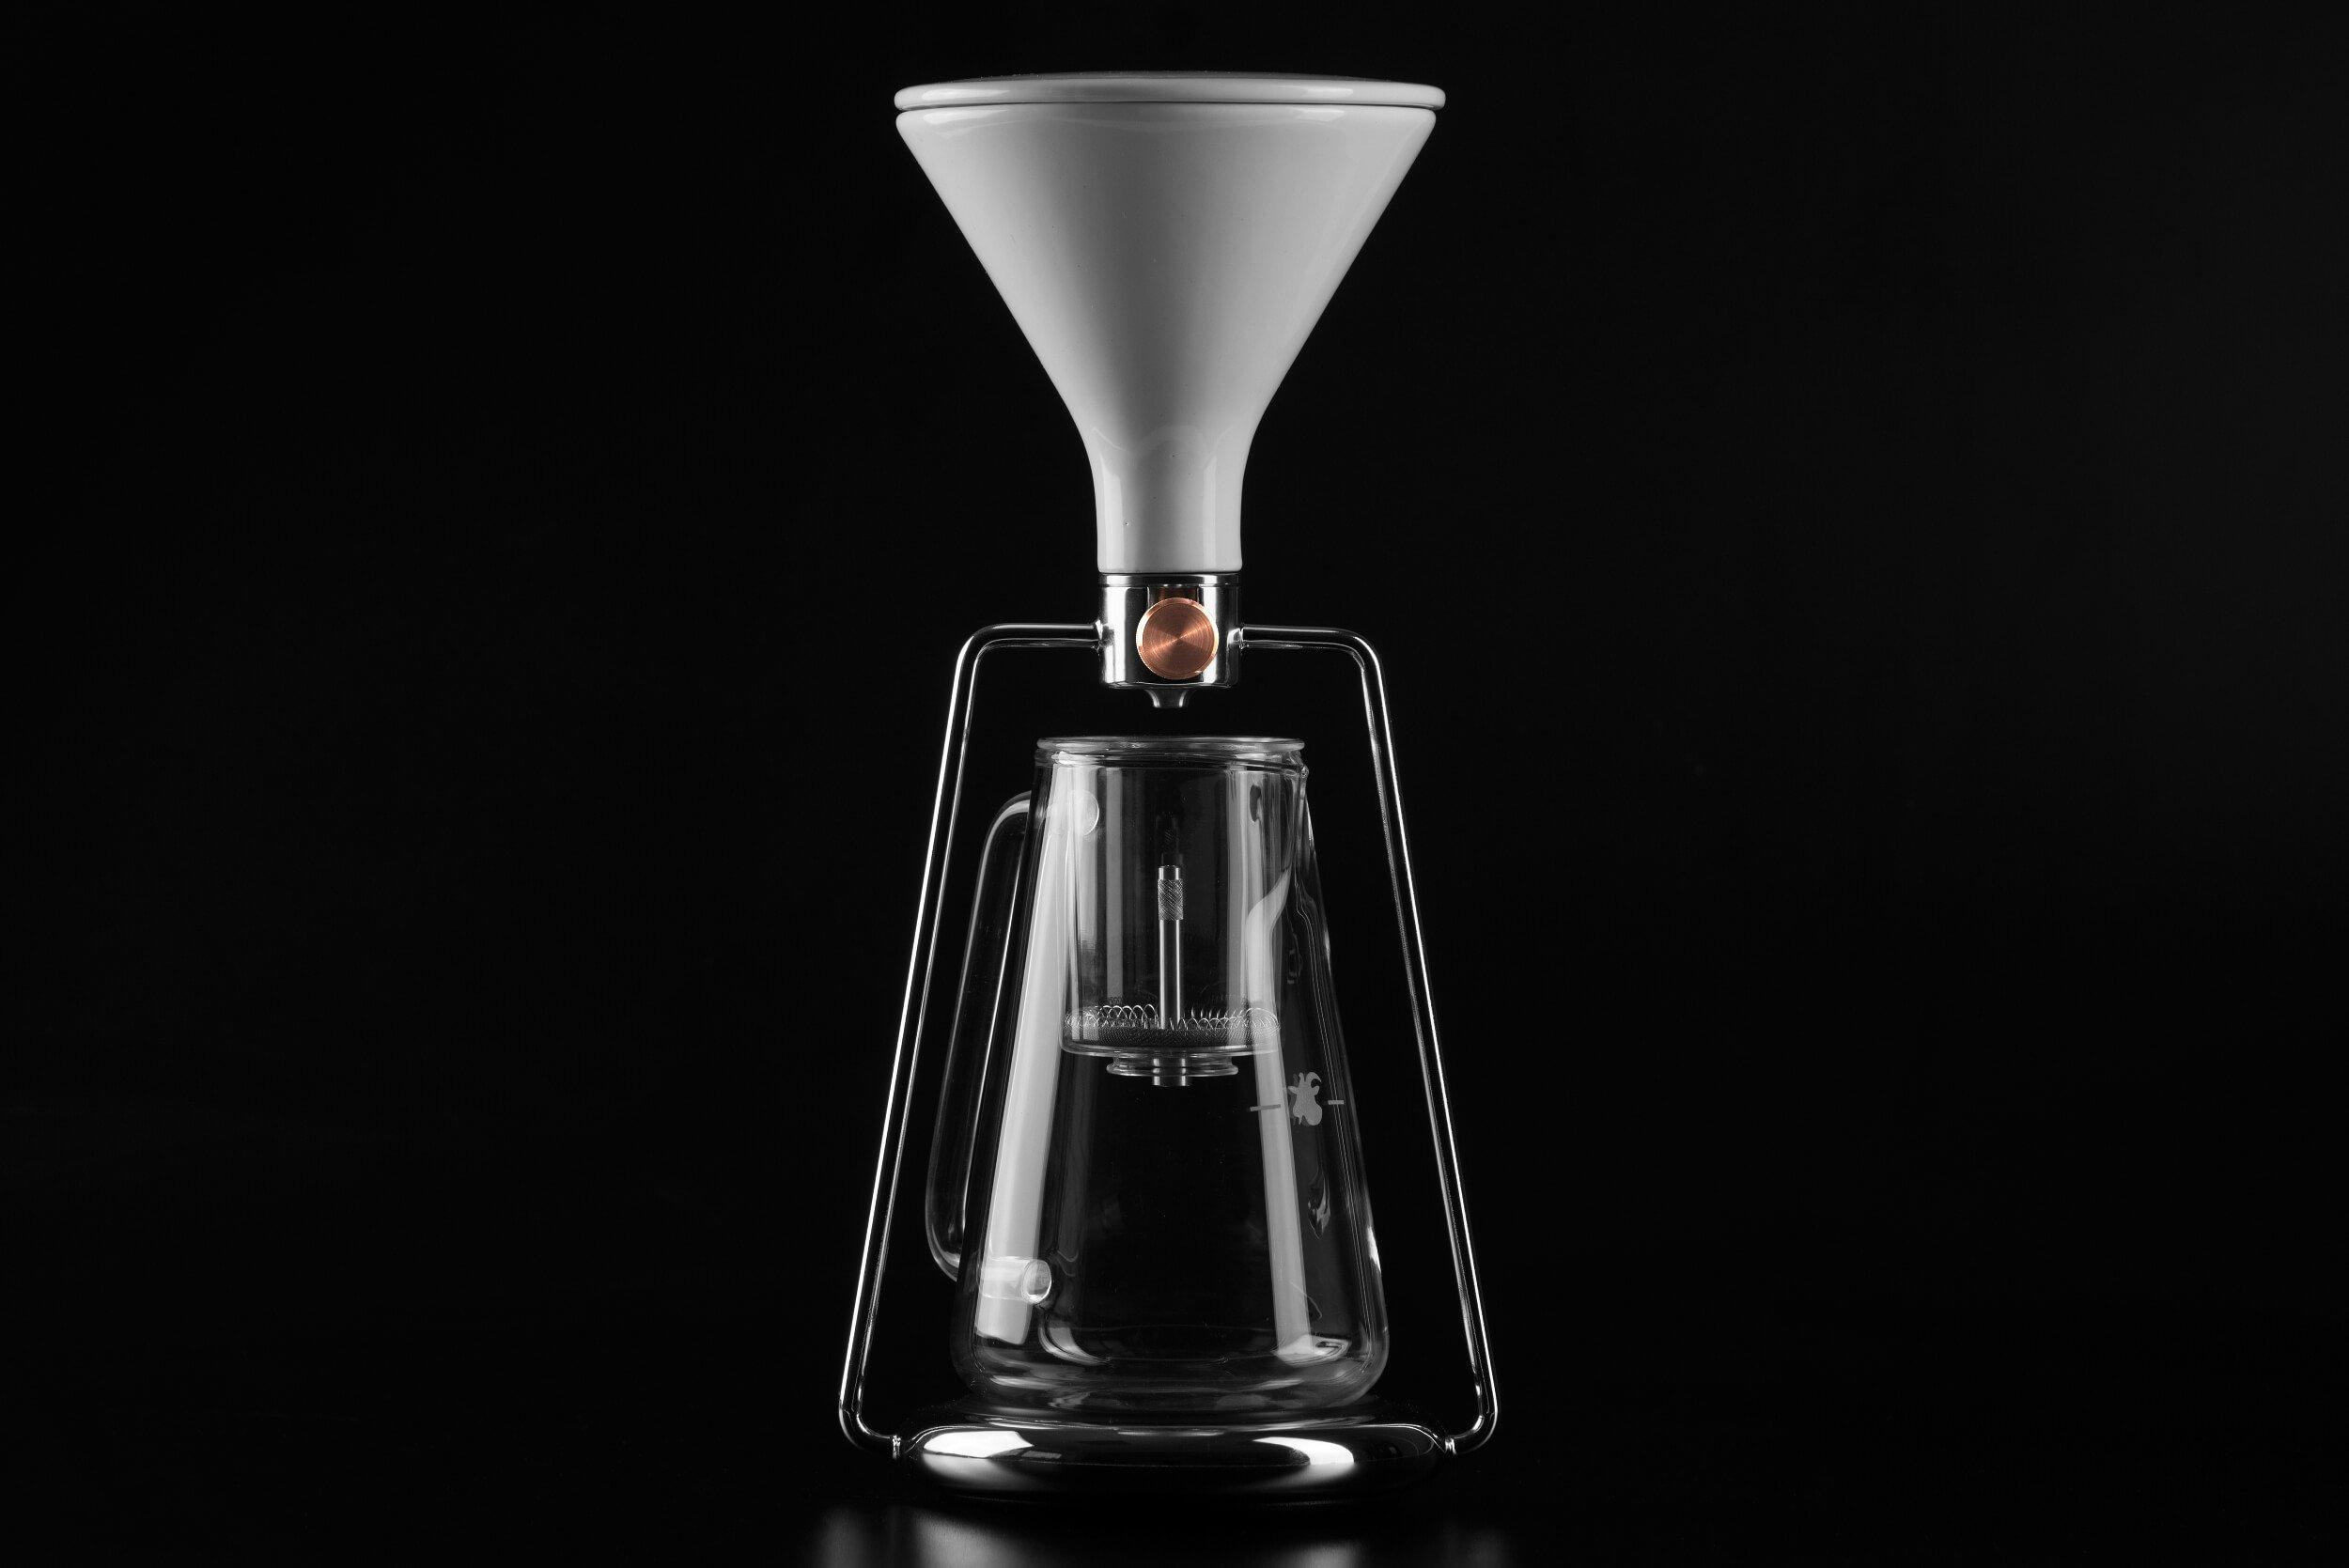 Goat Story Gina Smart Coffee Instrument The Sinsa Thesinsa Com